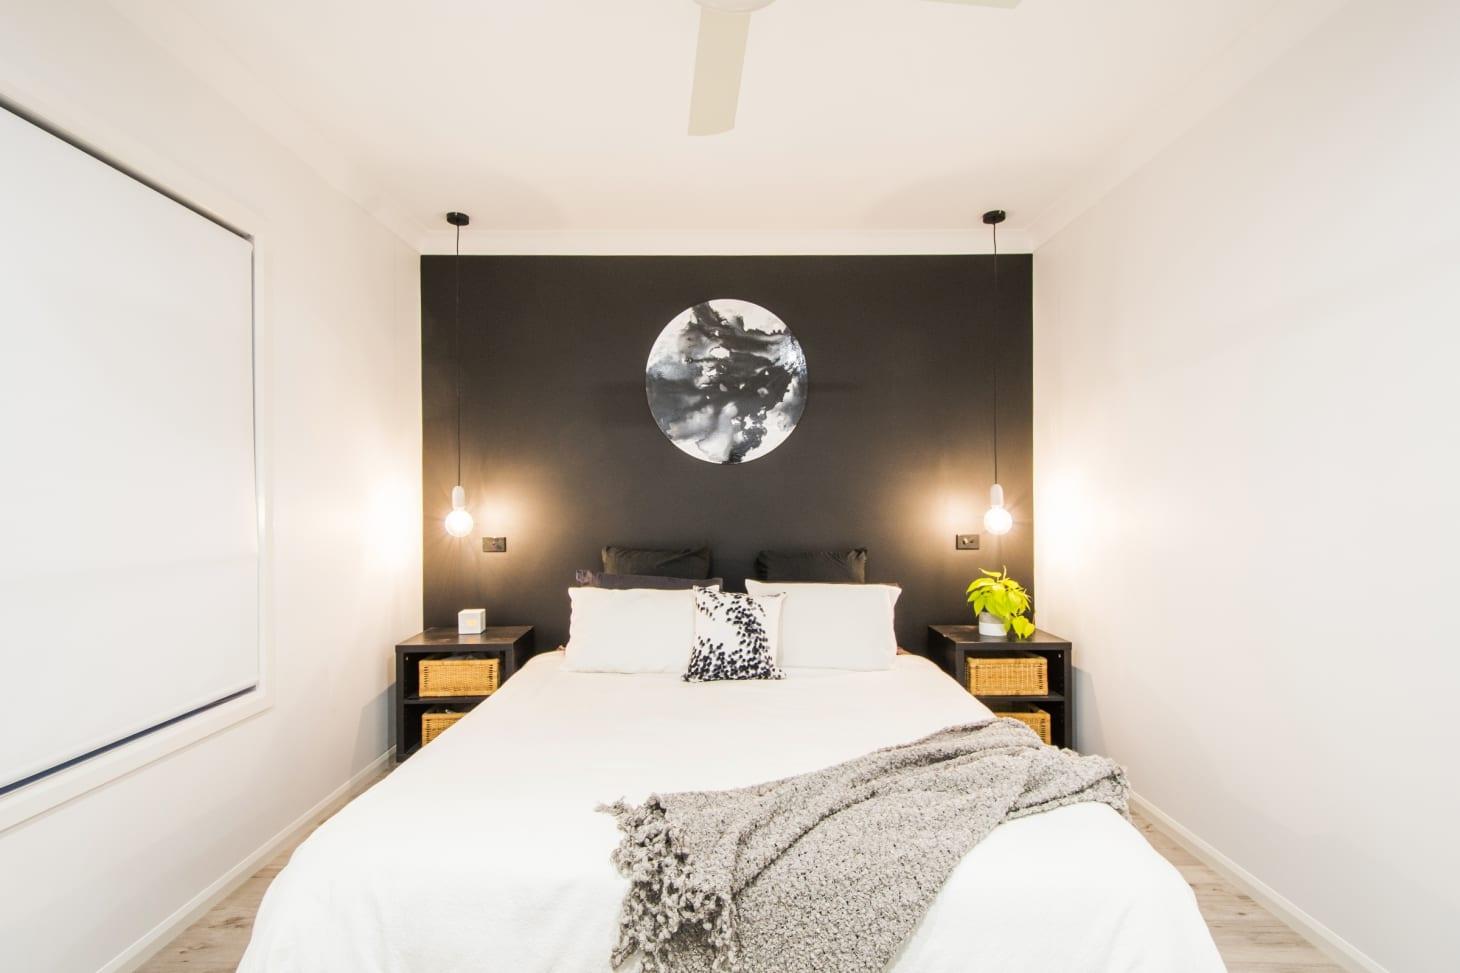 Inspirasi kamar tidur minimalis dengan dinding aksen - source: apartmenttherapy.com